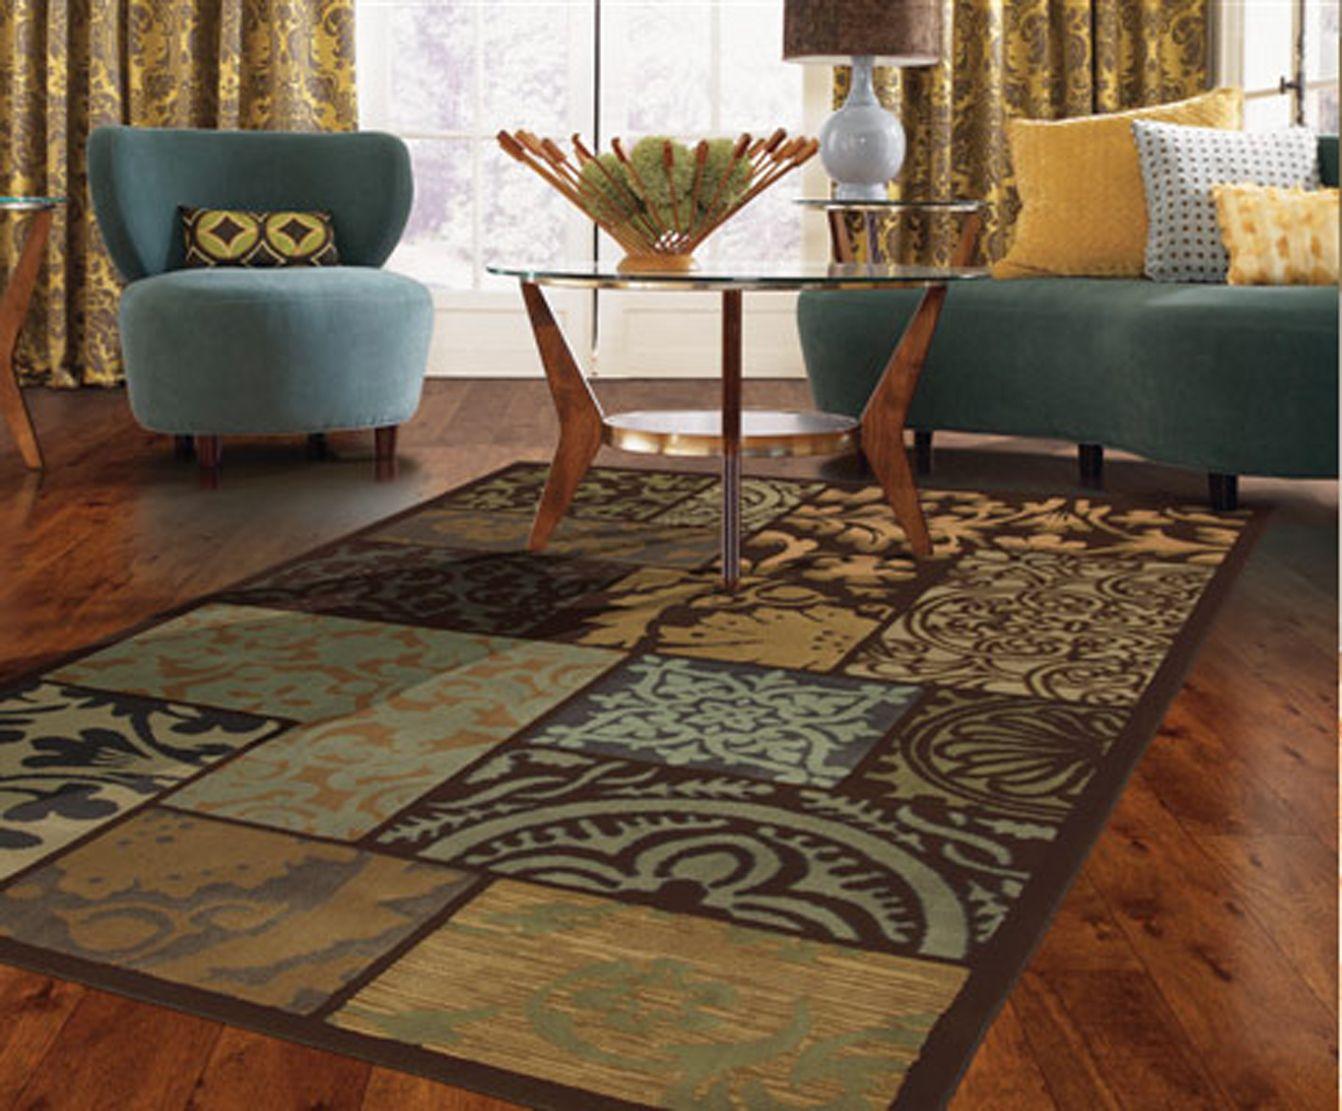 Best Images About DIY Rugs On Pinterest Make A Rug Rope Rug - Design rugs for living room